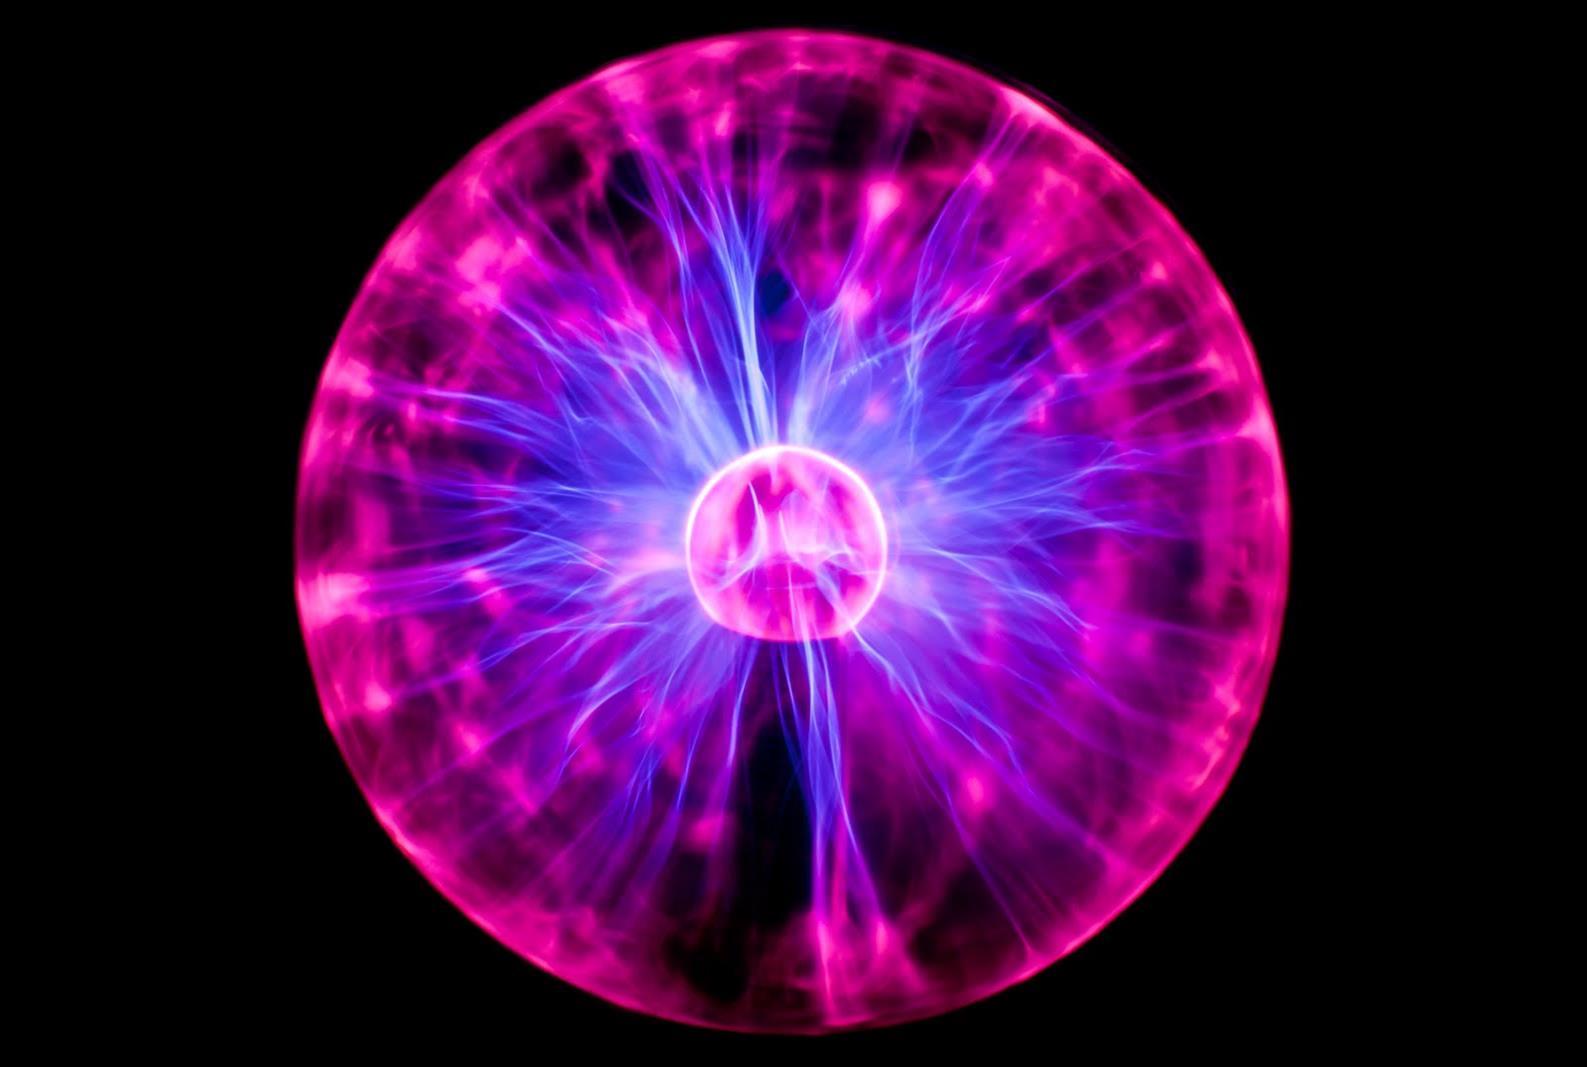 plasma matter picture - HD1587×1067